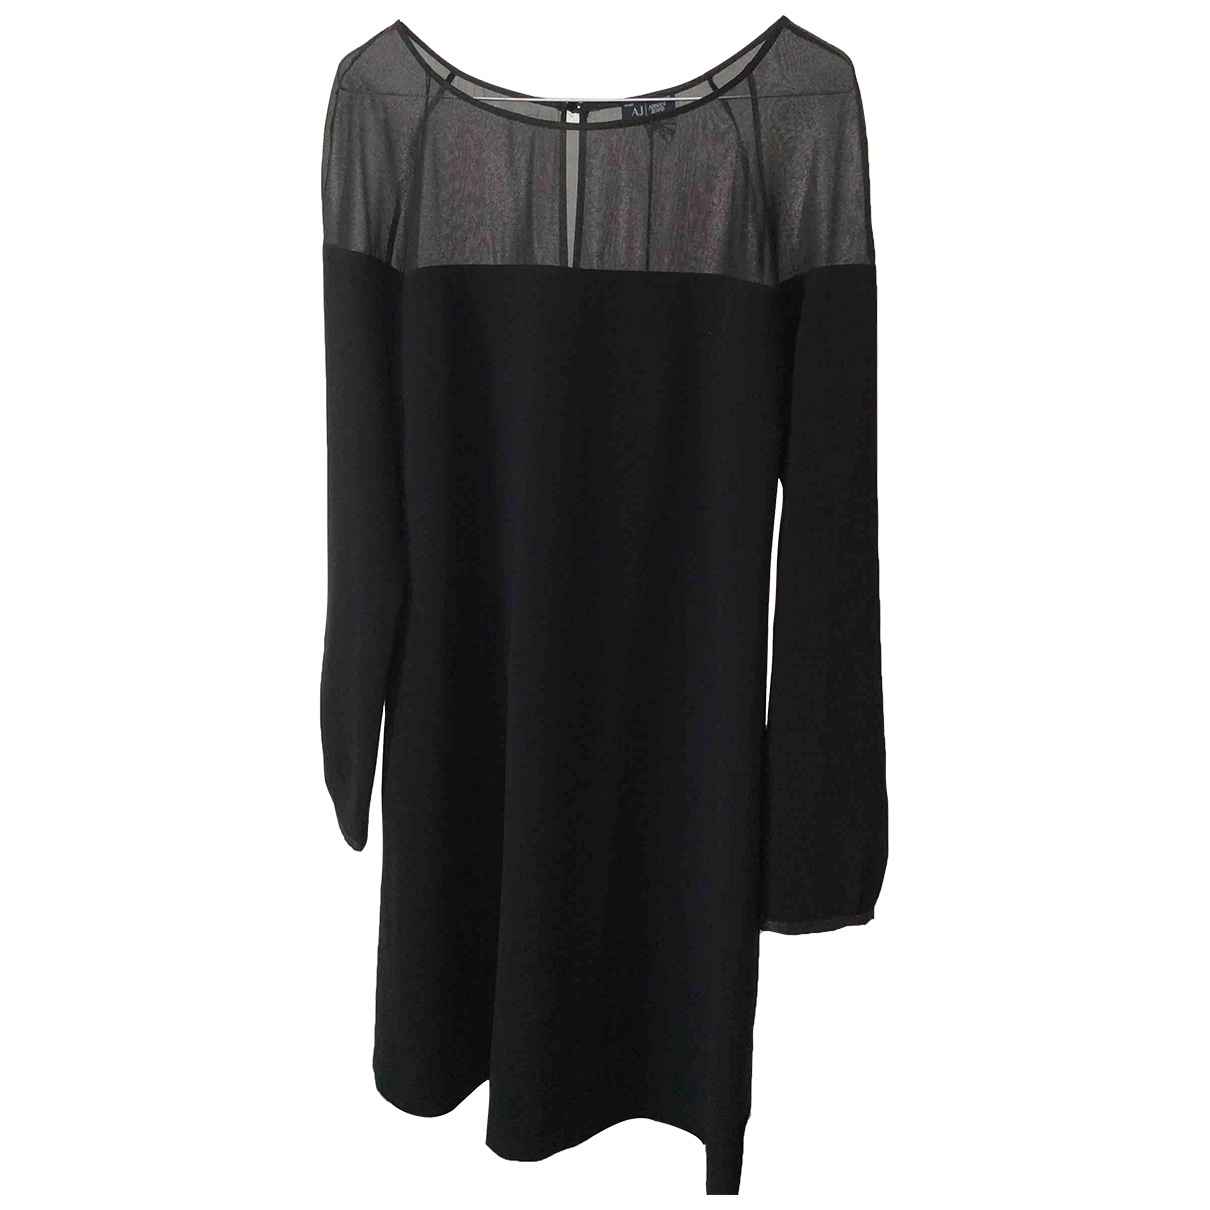 Armani Jeans \N Black dress for Women 4 US